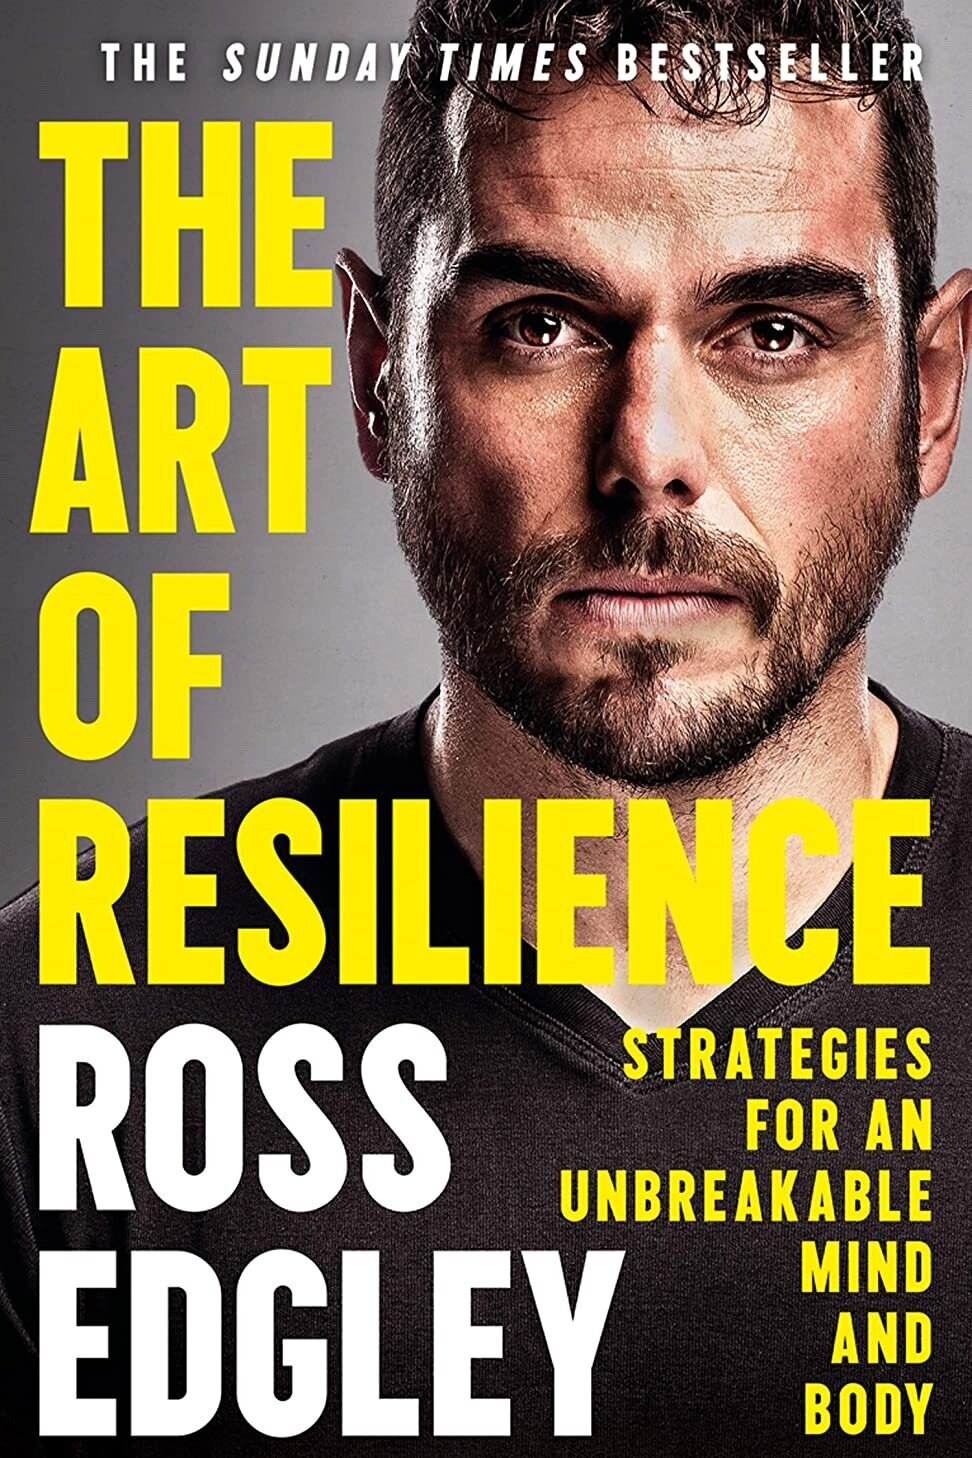 The+Art+of+Resilience+Sneakers.jpg